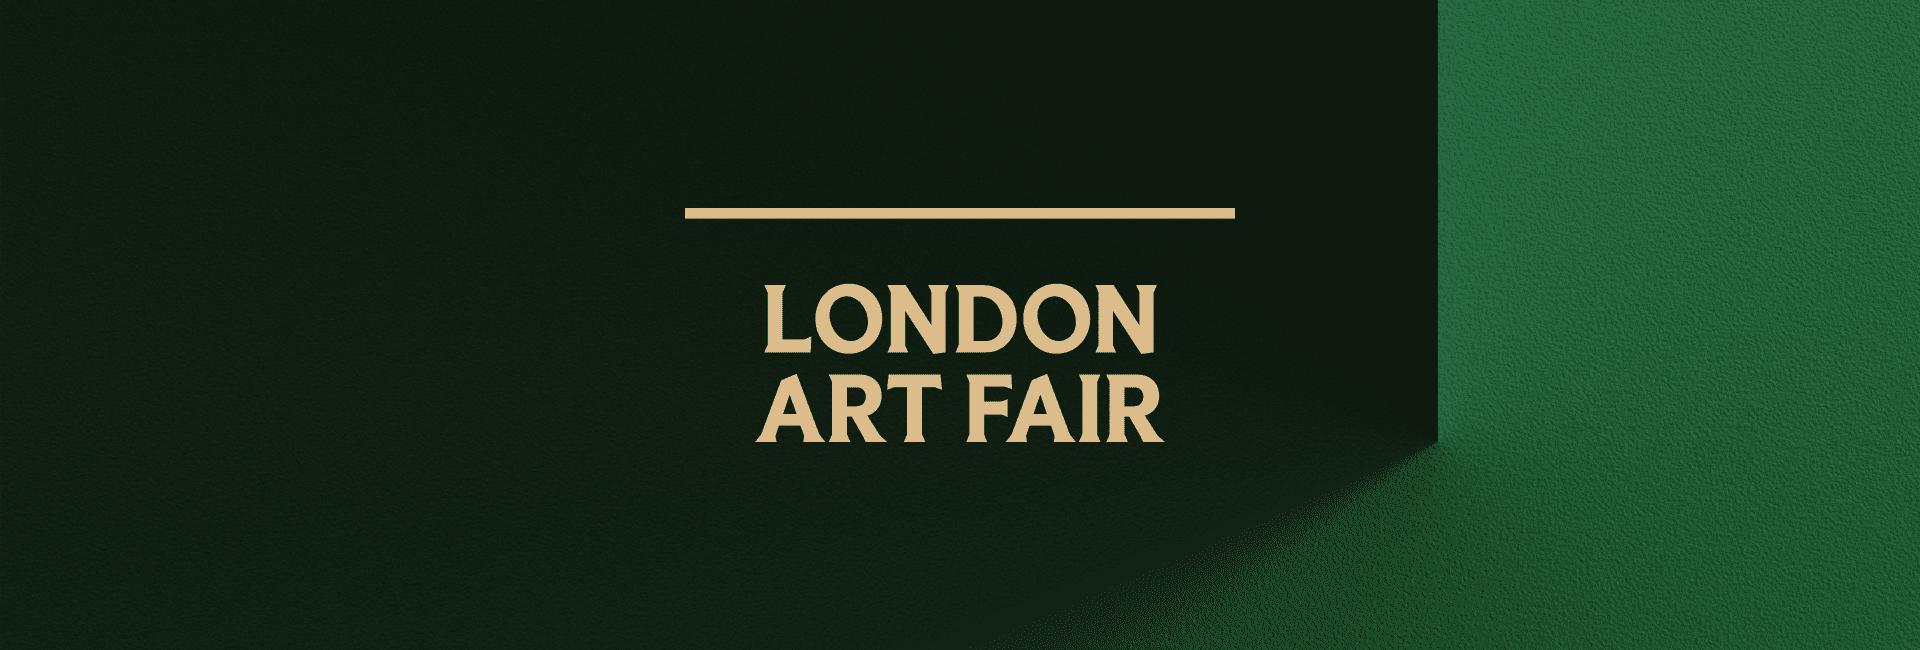 LAF21-Web-Banner-Inner-1920x650-green-logo